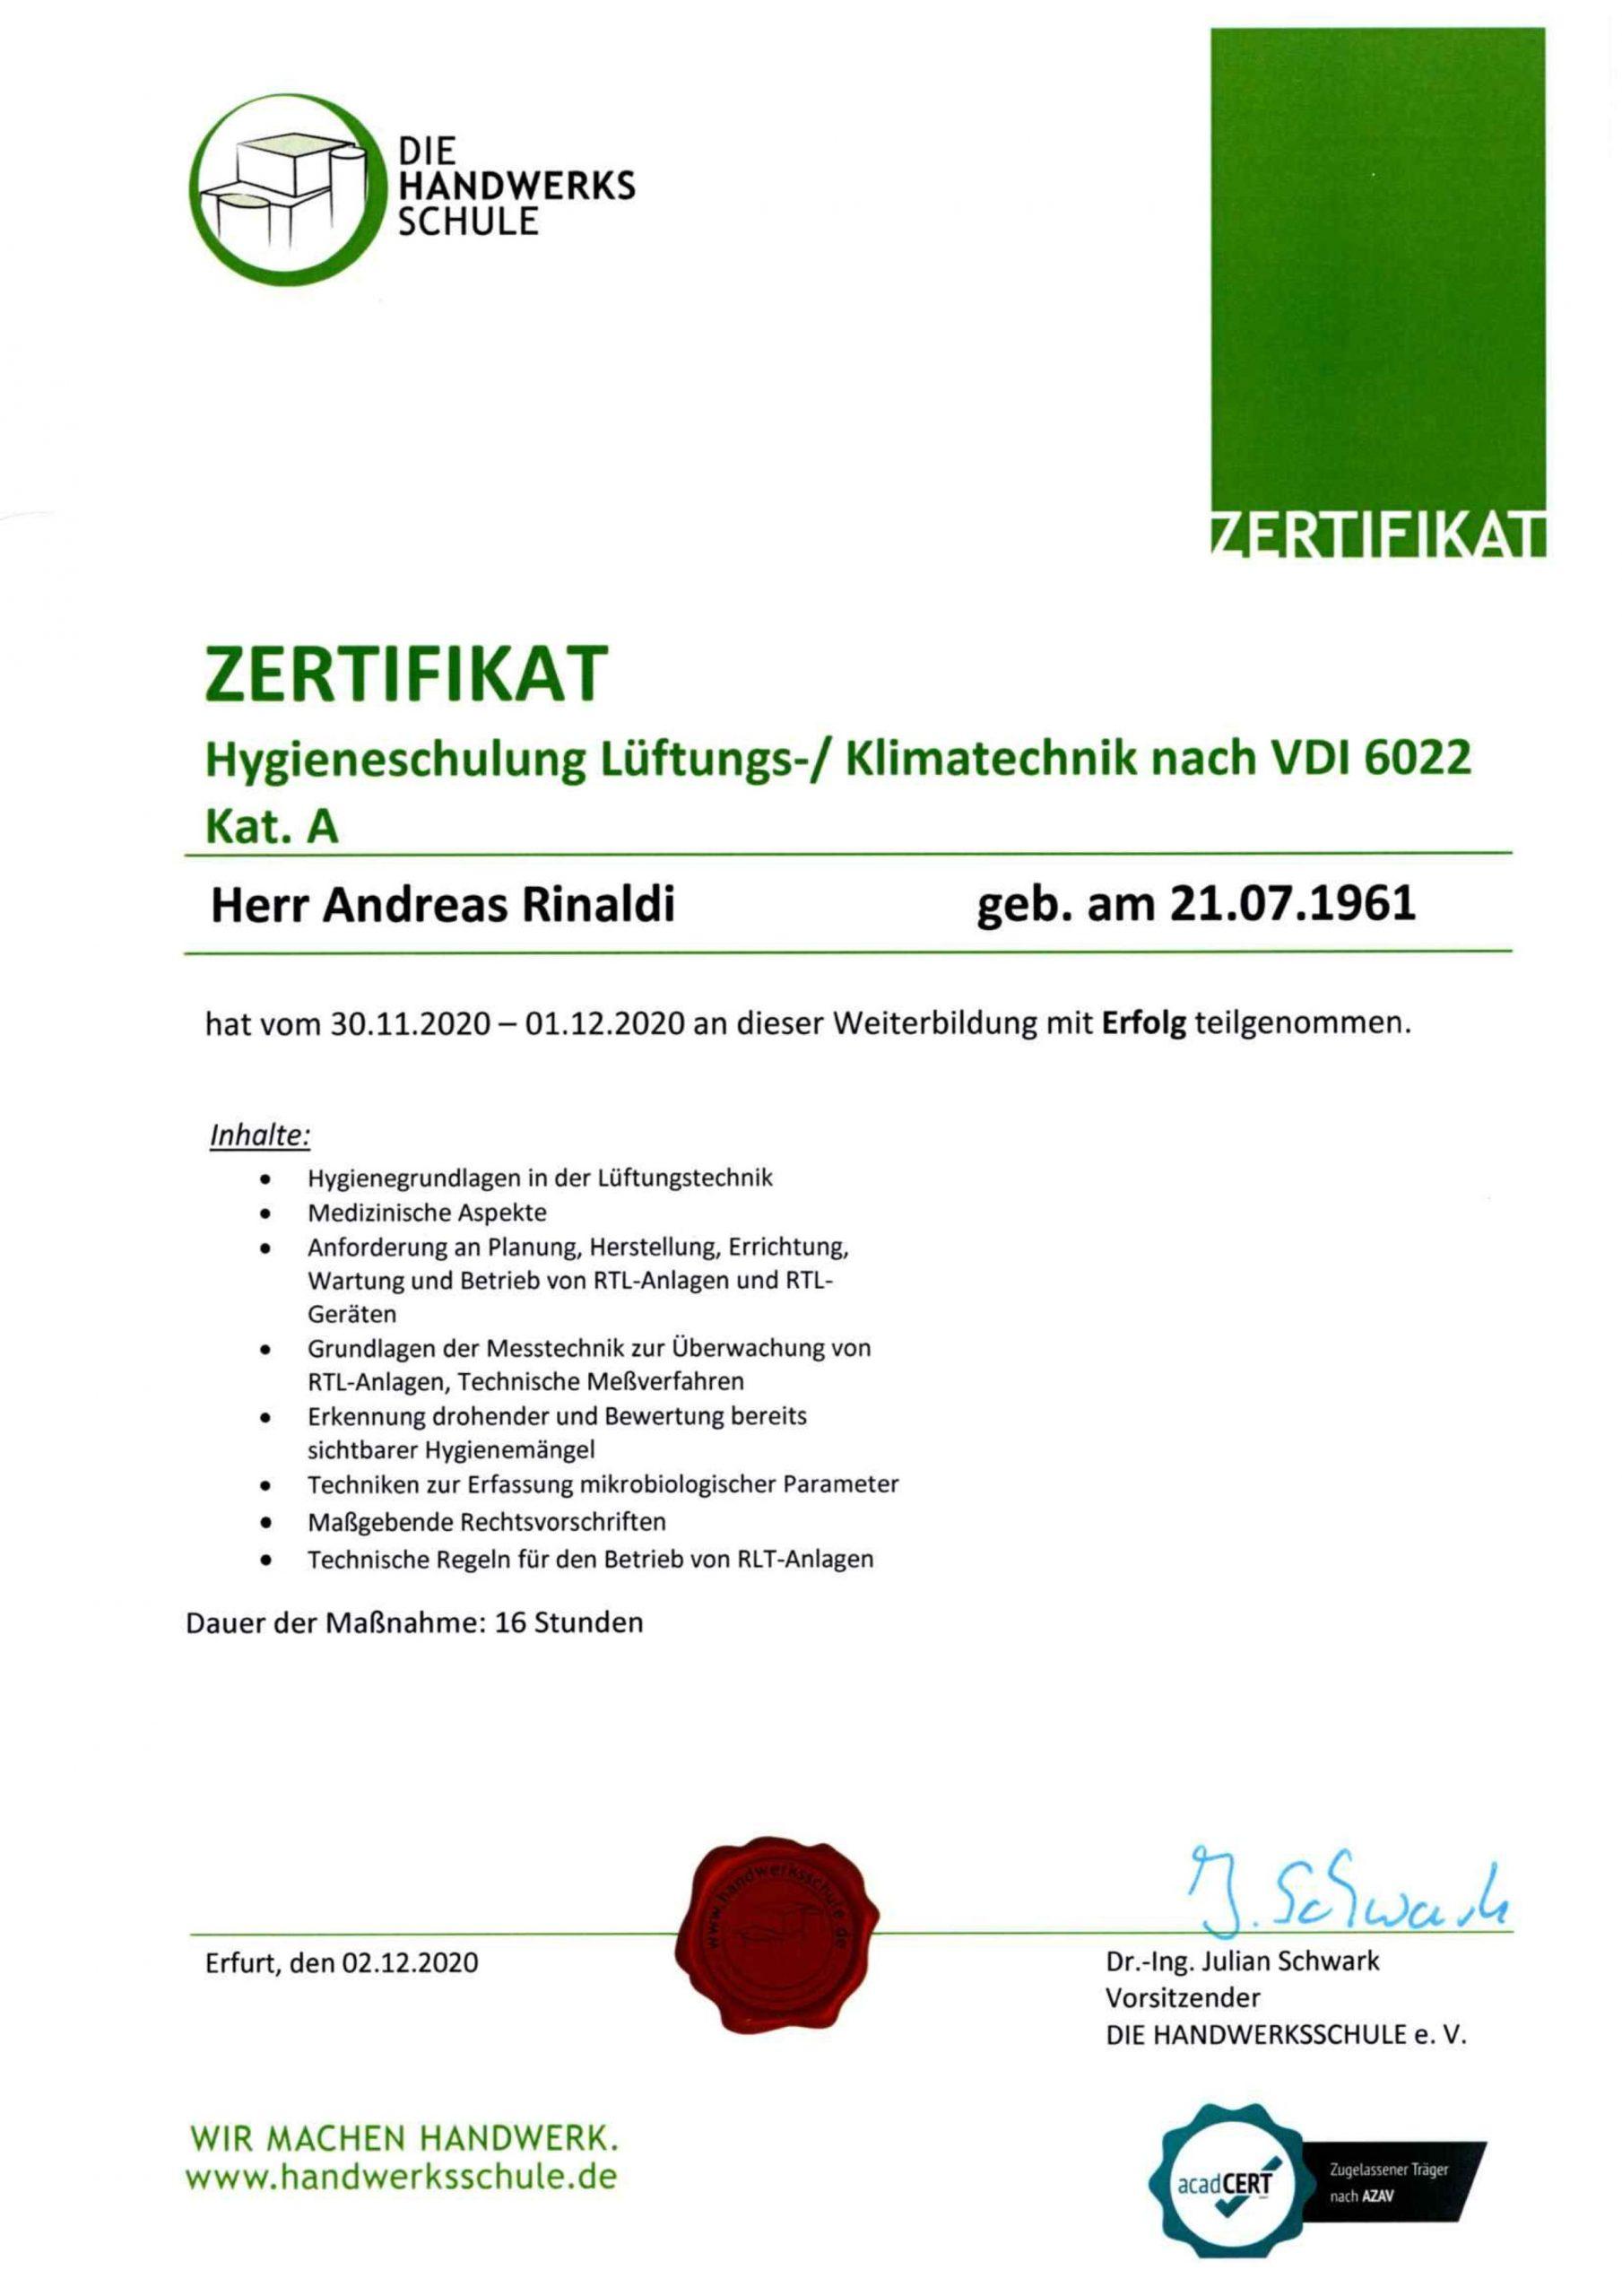 Zertifikat Lüftungs,- Klimatechnik